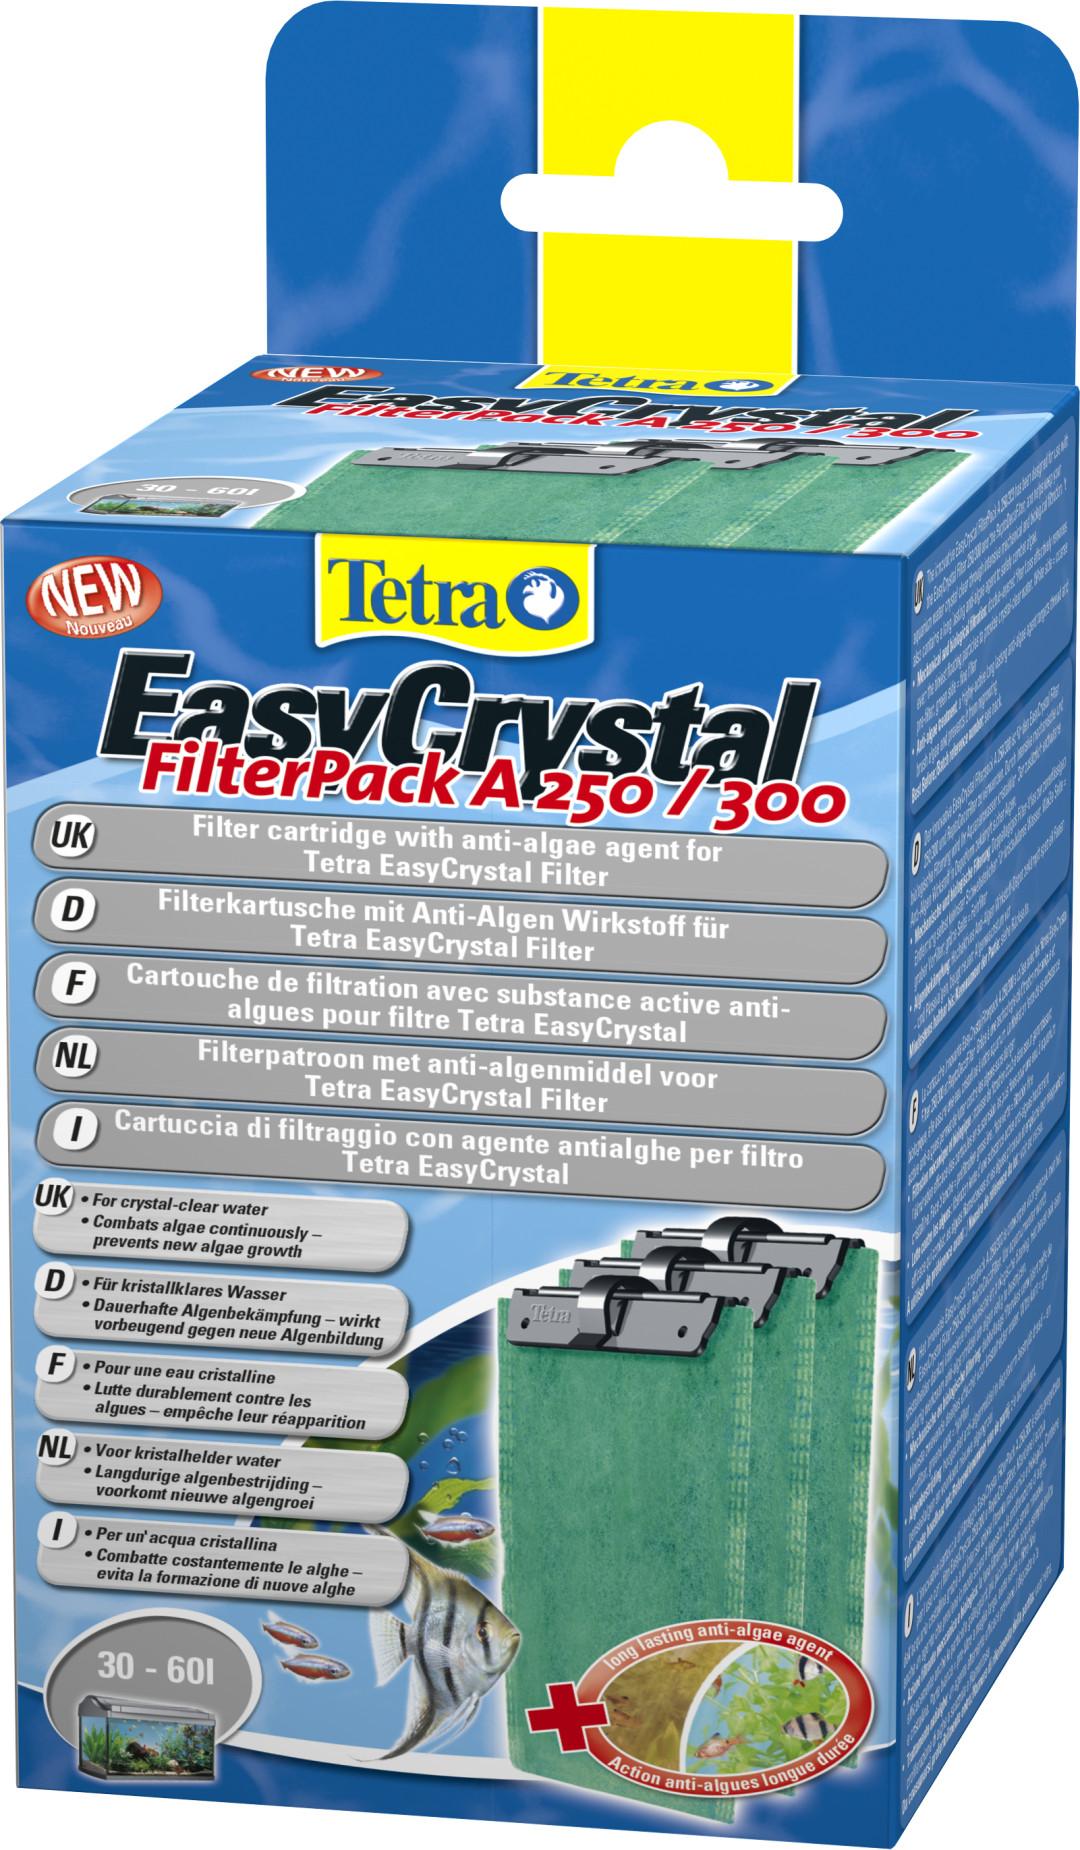 Tetra EasyCrystal filterpack A250/300 <br>60 ltr